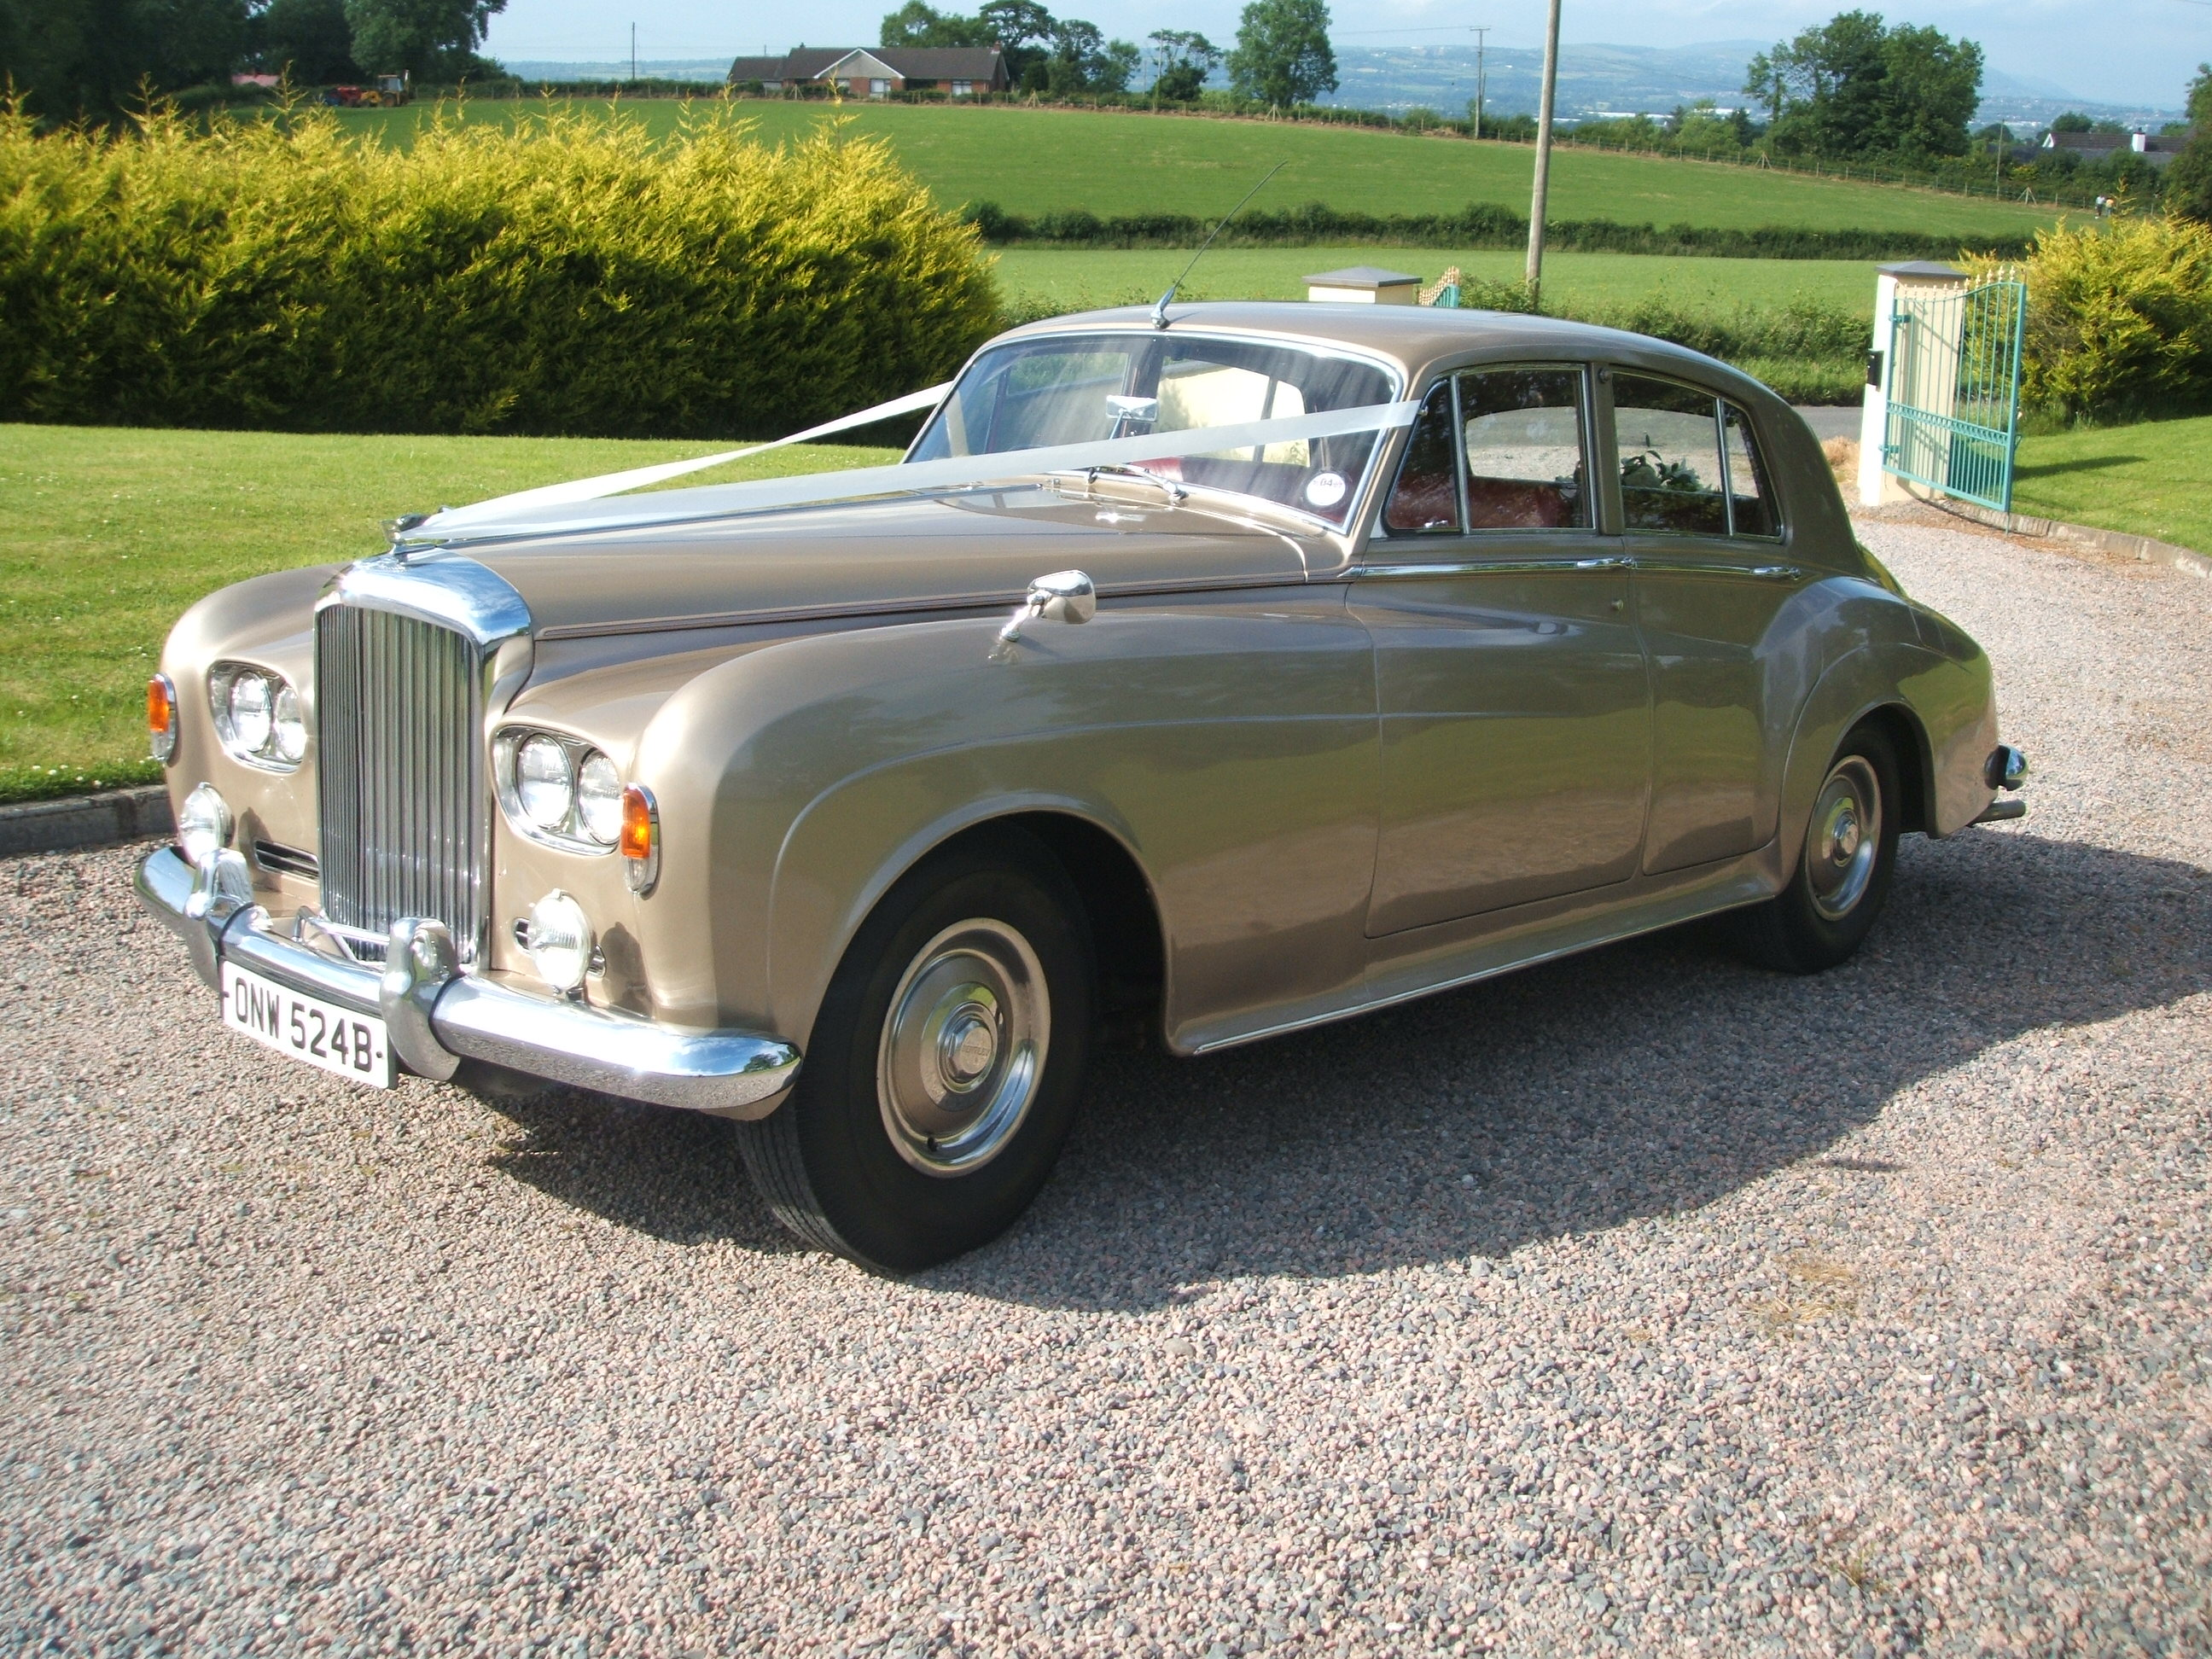 This stunning 1964 Bentley is